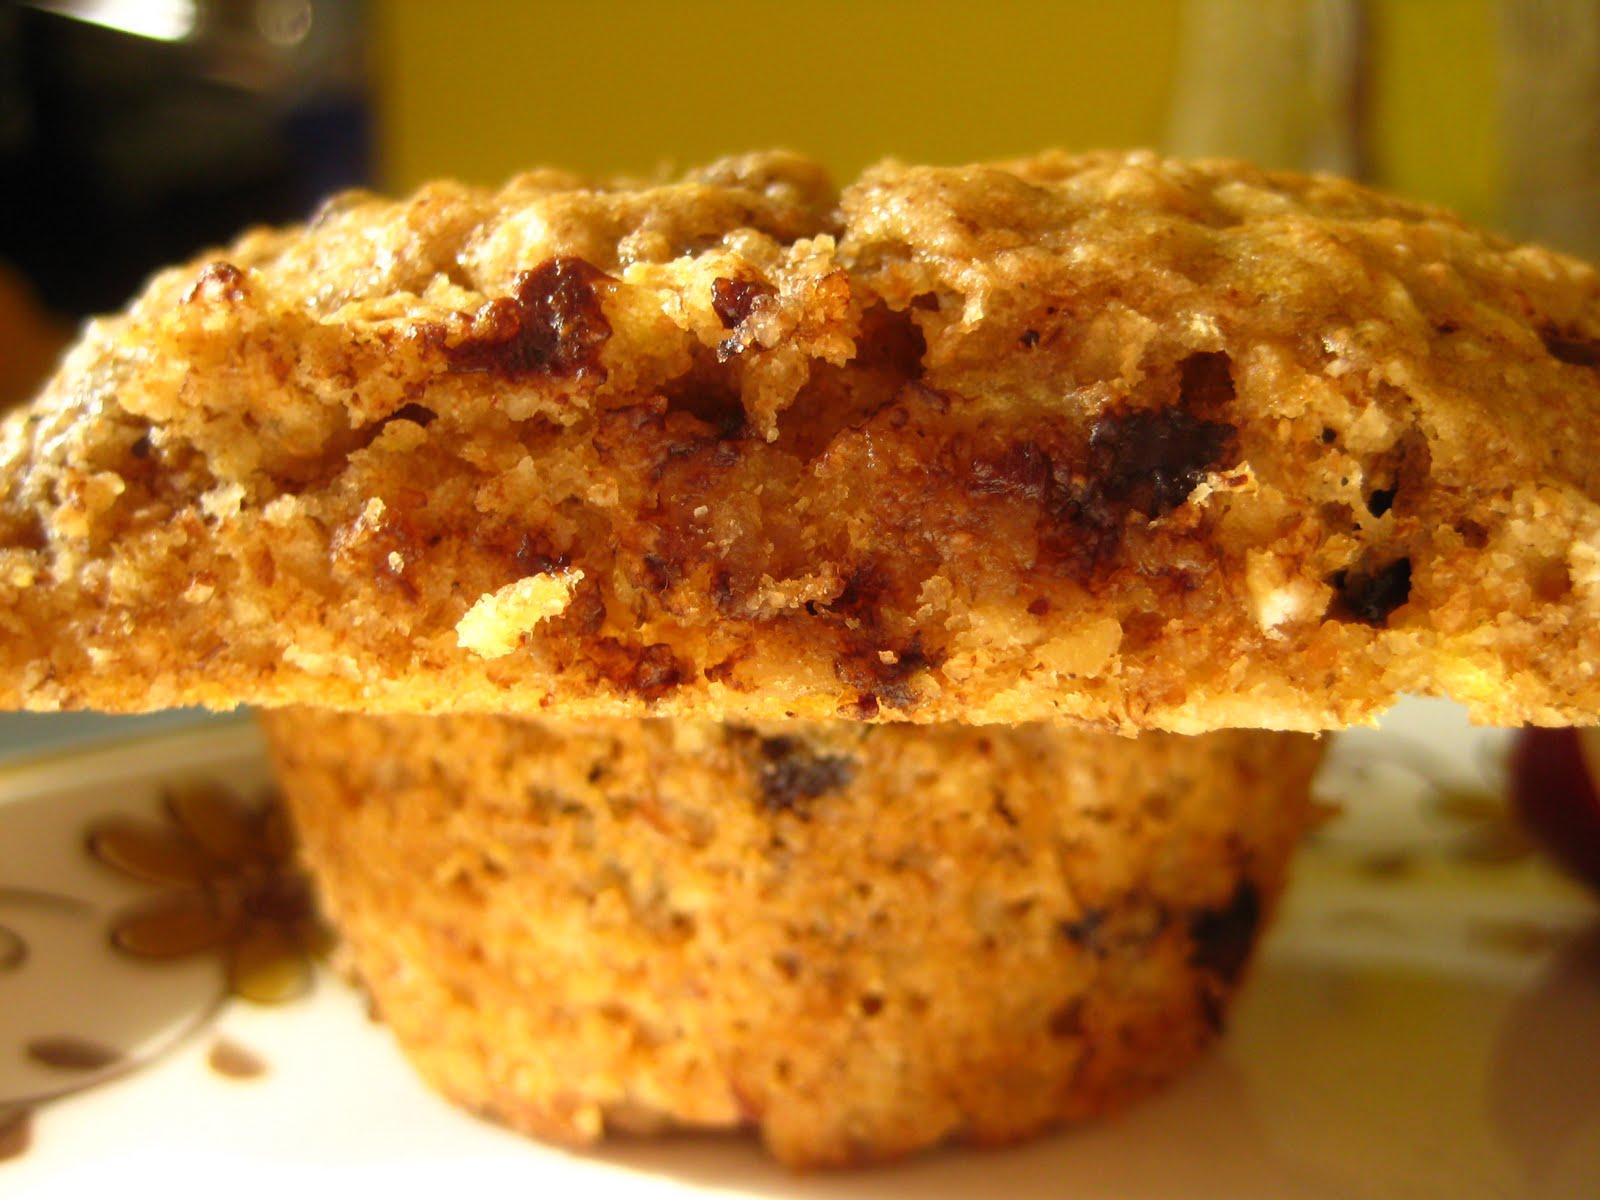 Cook&Bake: Banana Oatmeal Chocolate Chip Muffins.